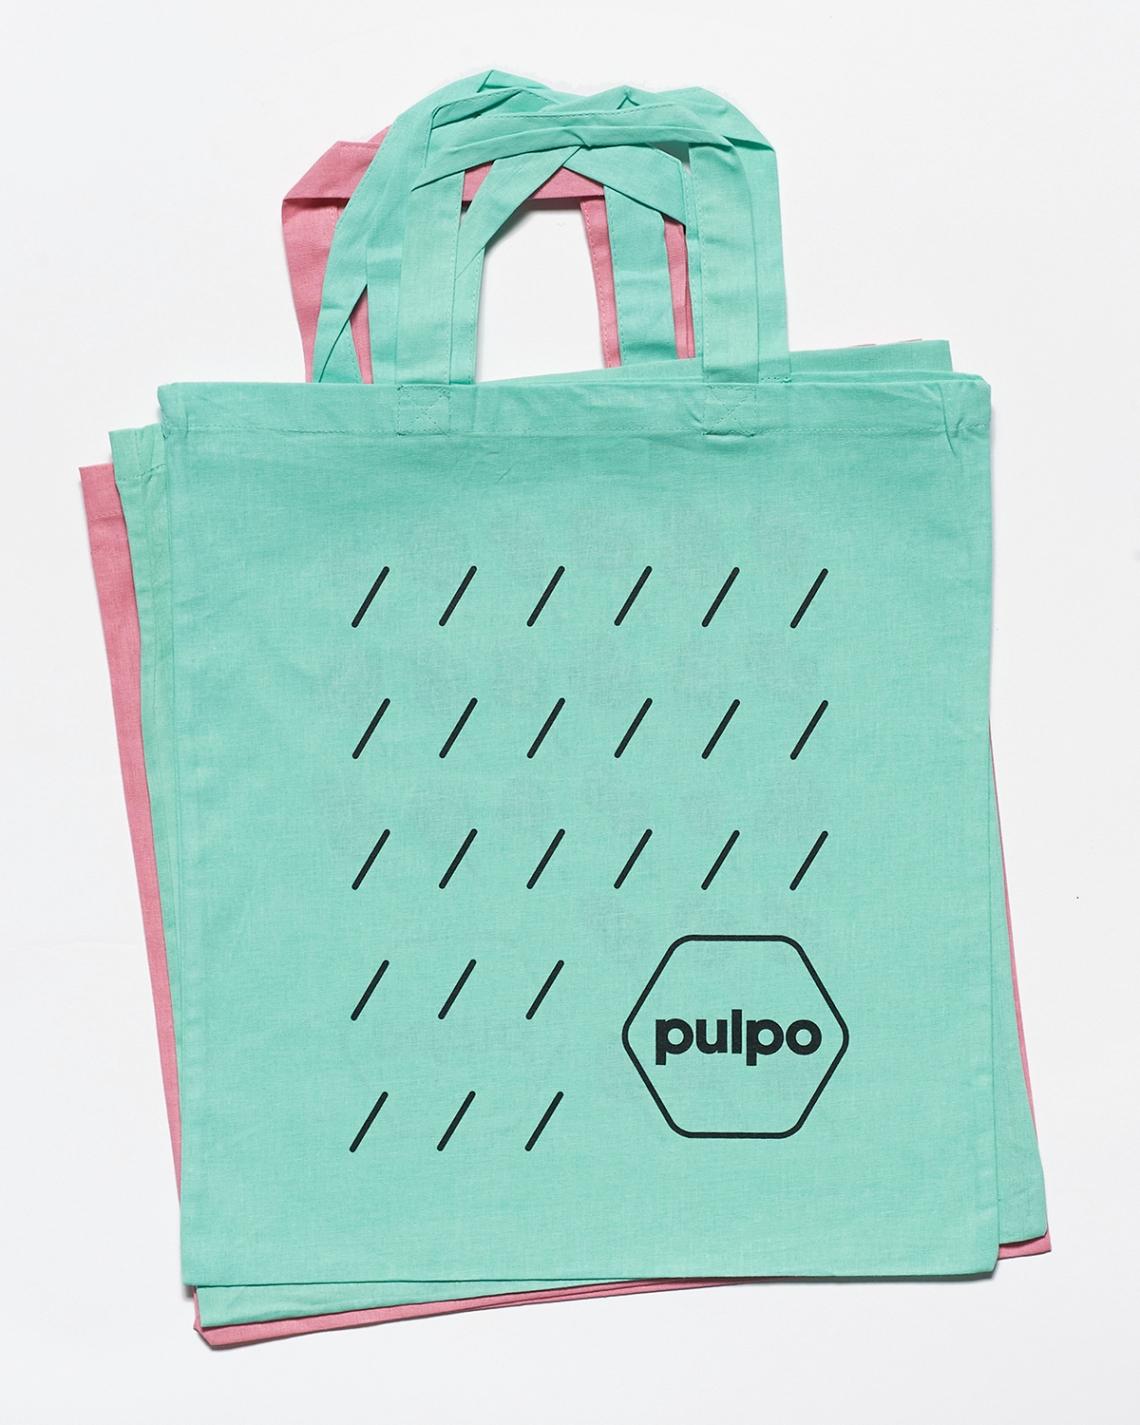 sign_pulpo004